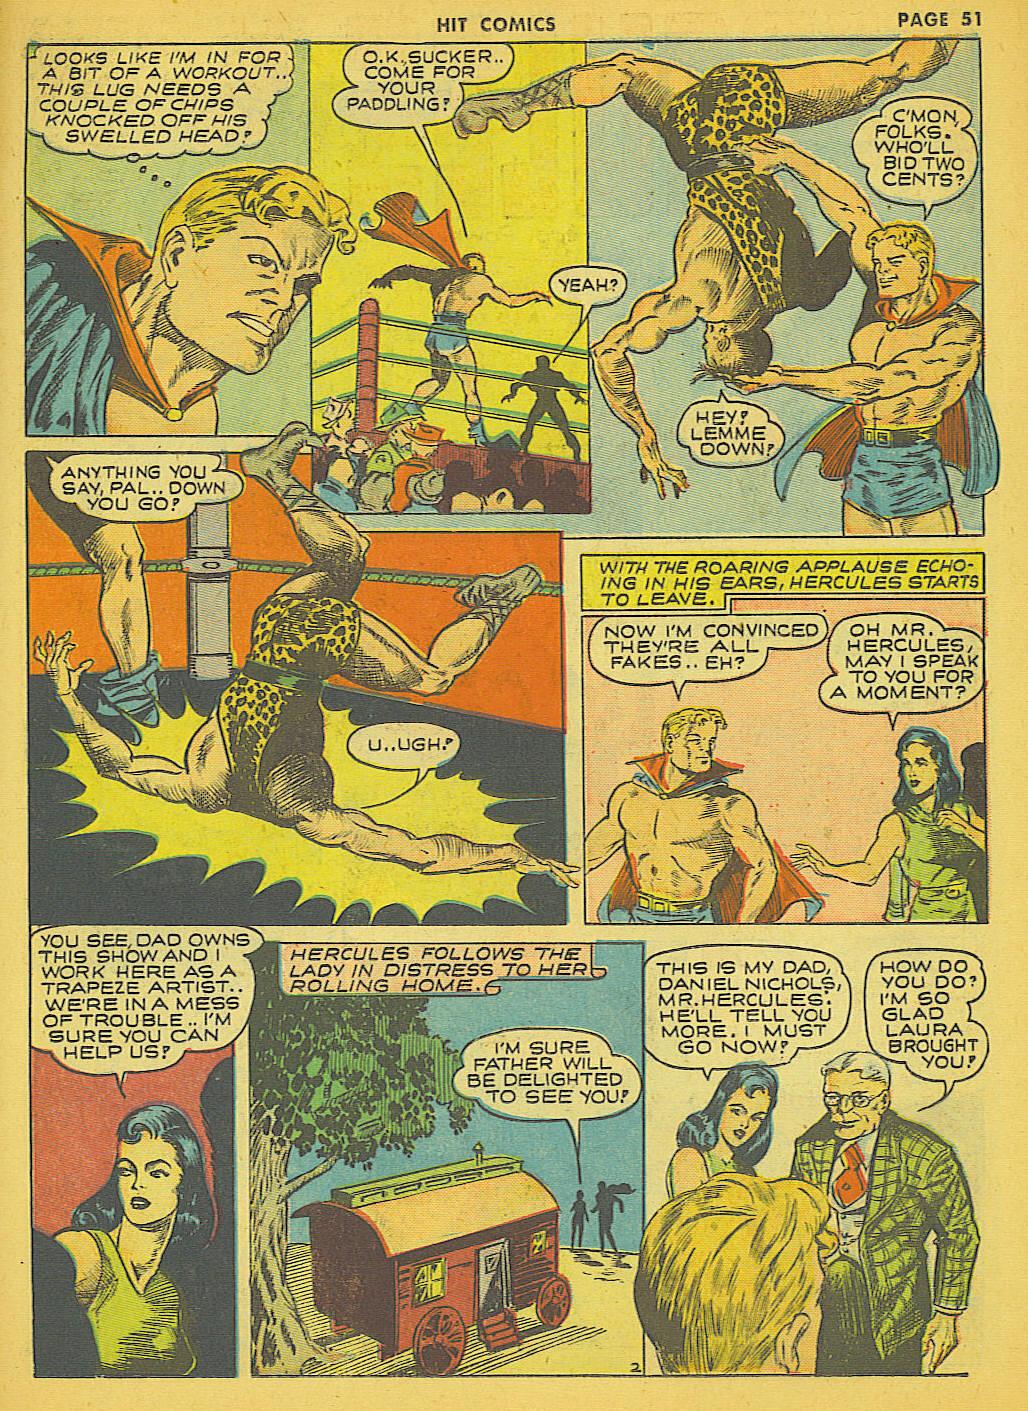 Read online Hit Comics comic -  Issue #21 - 53